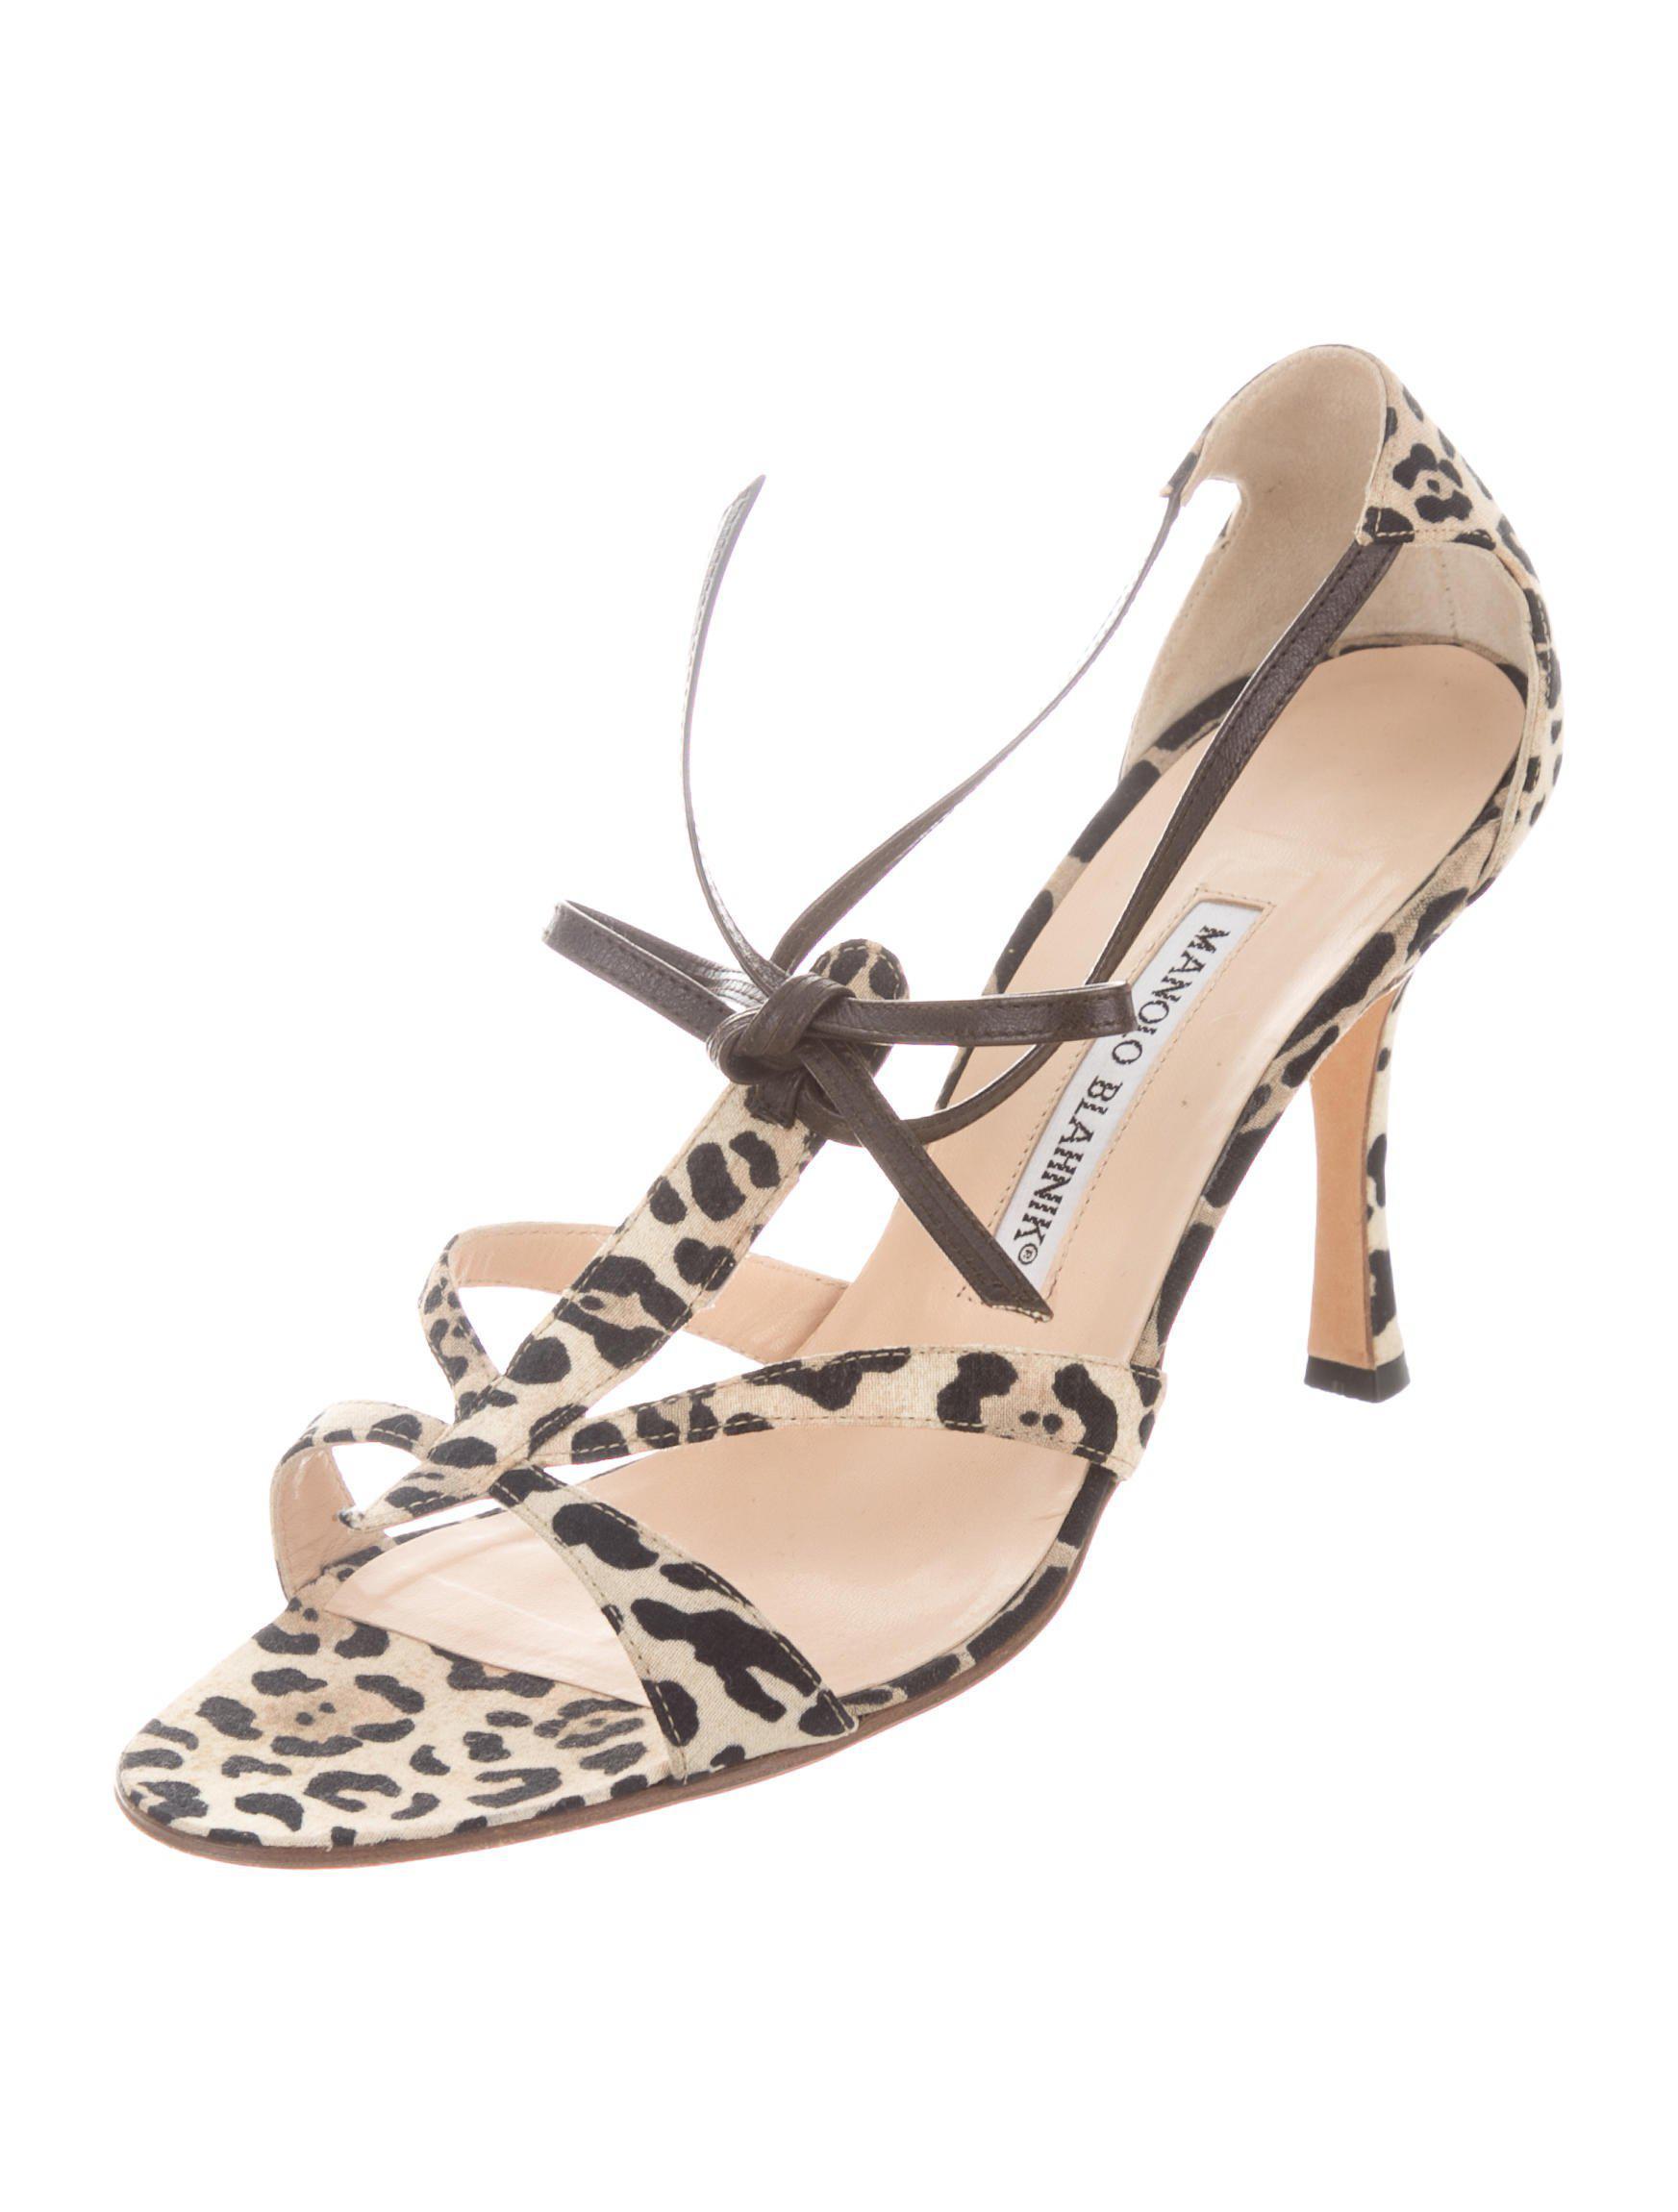 107ef0e63f0 ... Stuart Weitzman Nudist Calf Hair Ankle Strap Sandal Leopard ...